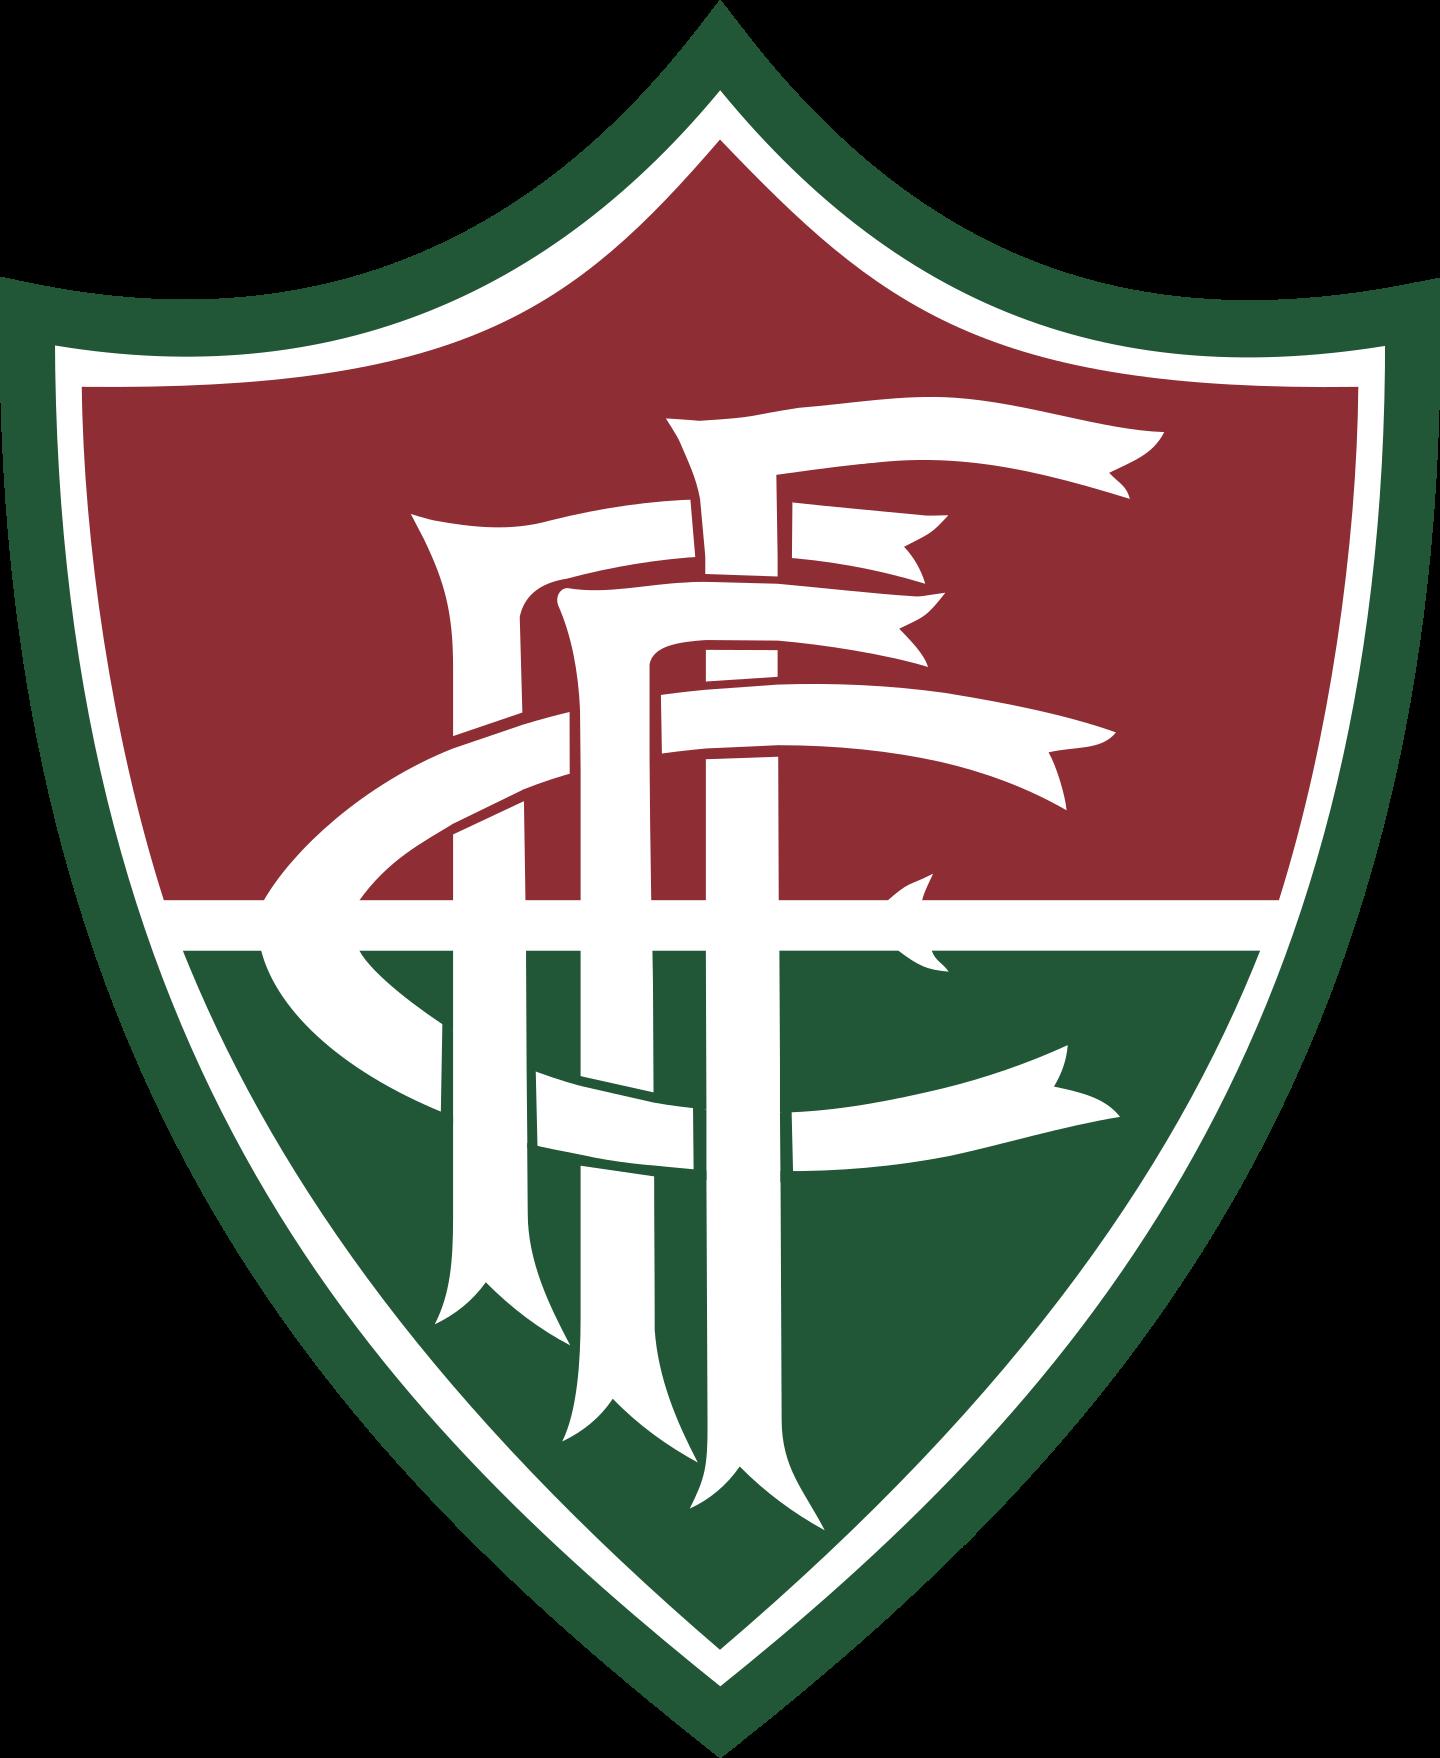 fluminense de feira logo 3 - Fluminense de Feira FC Logo